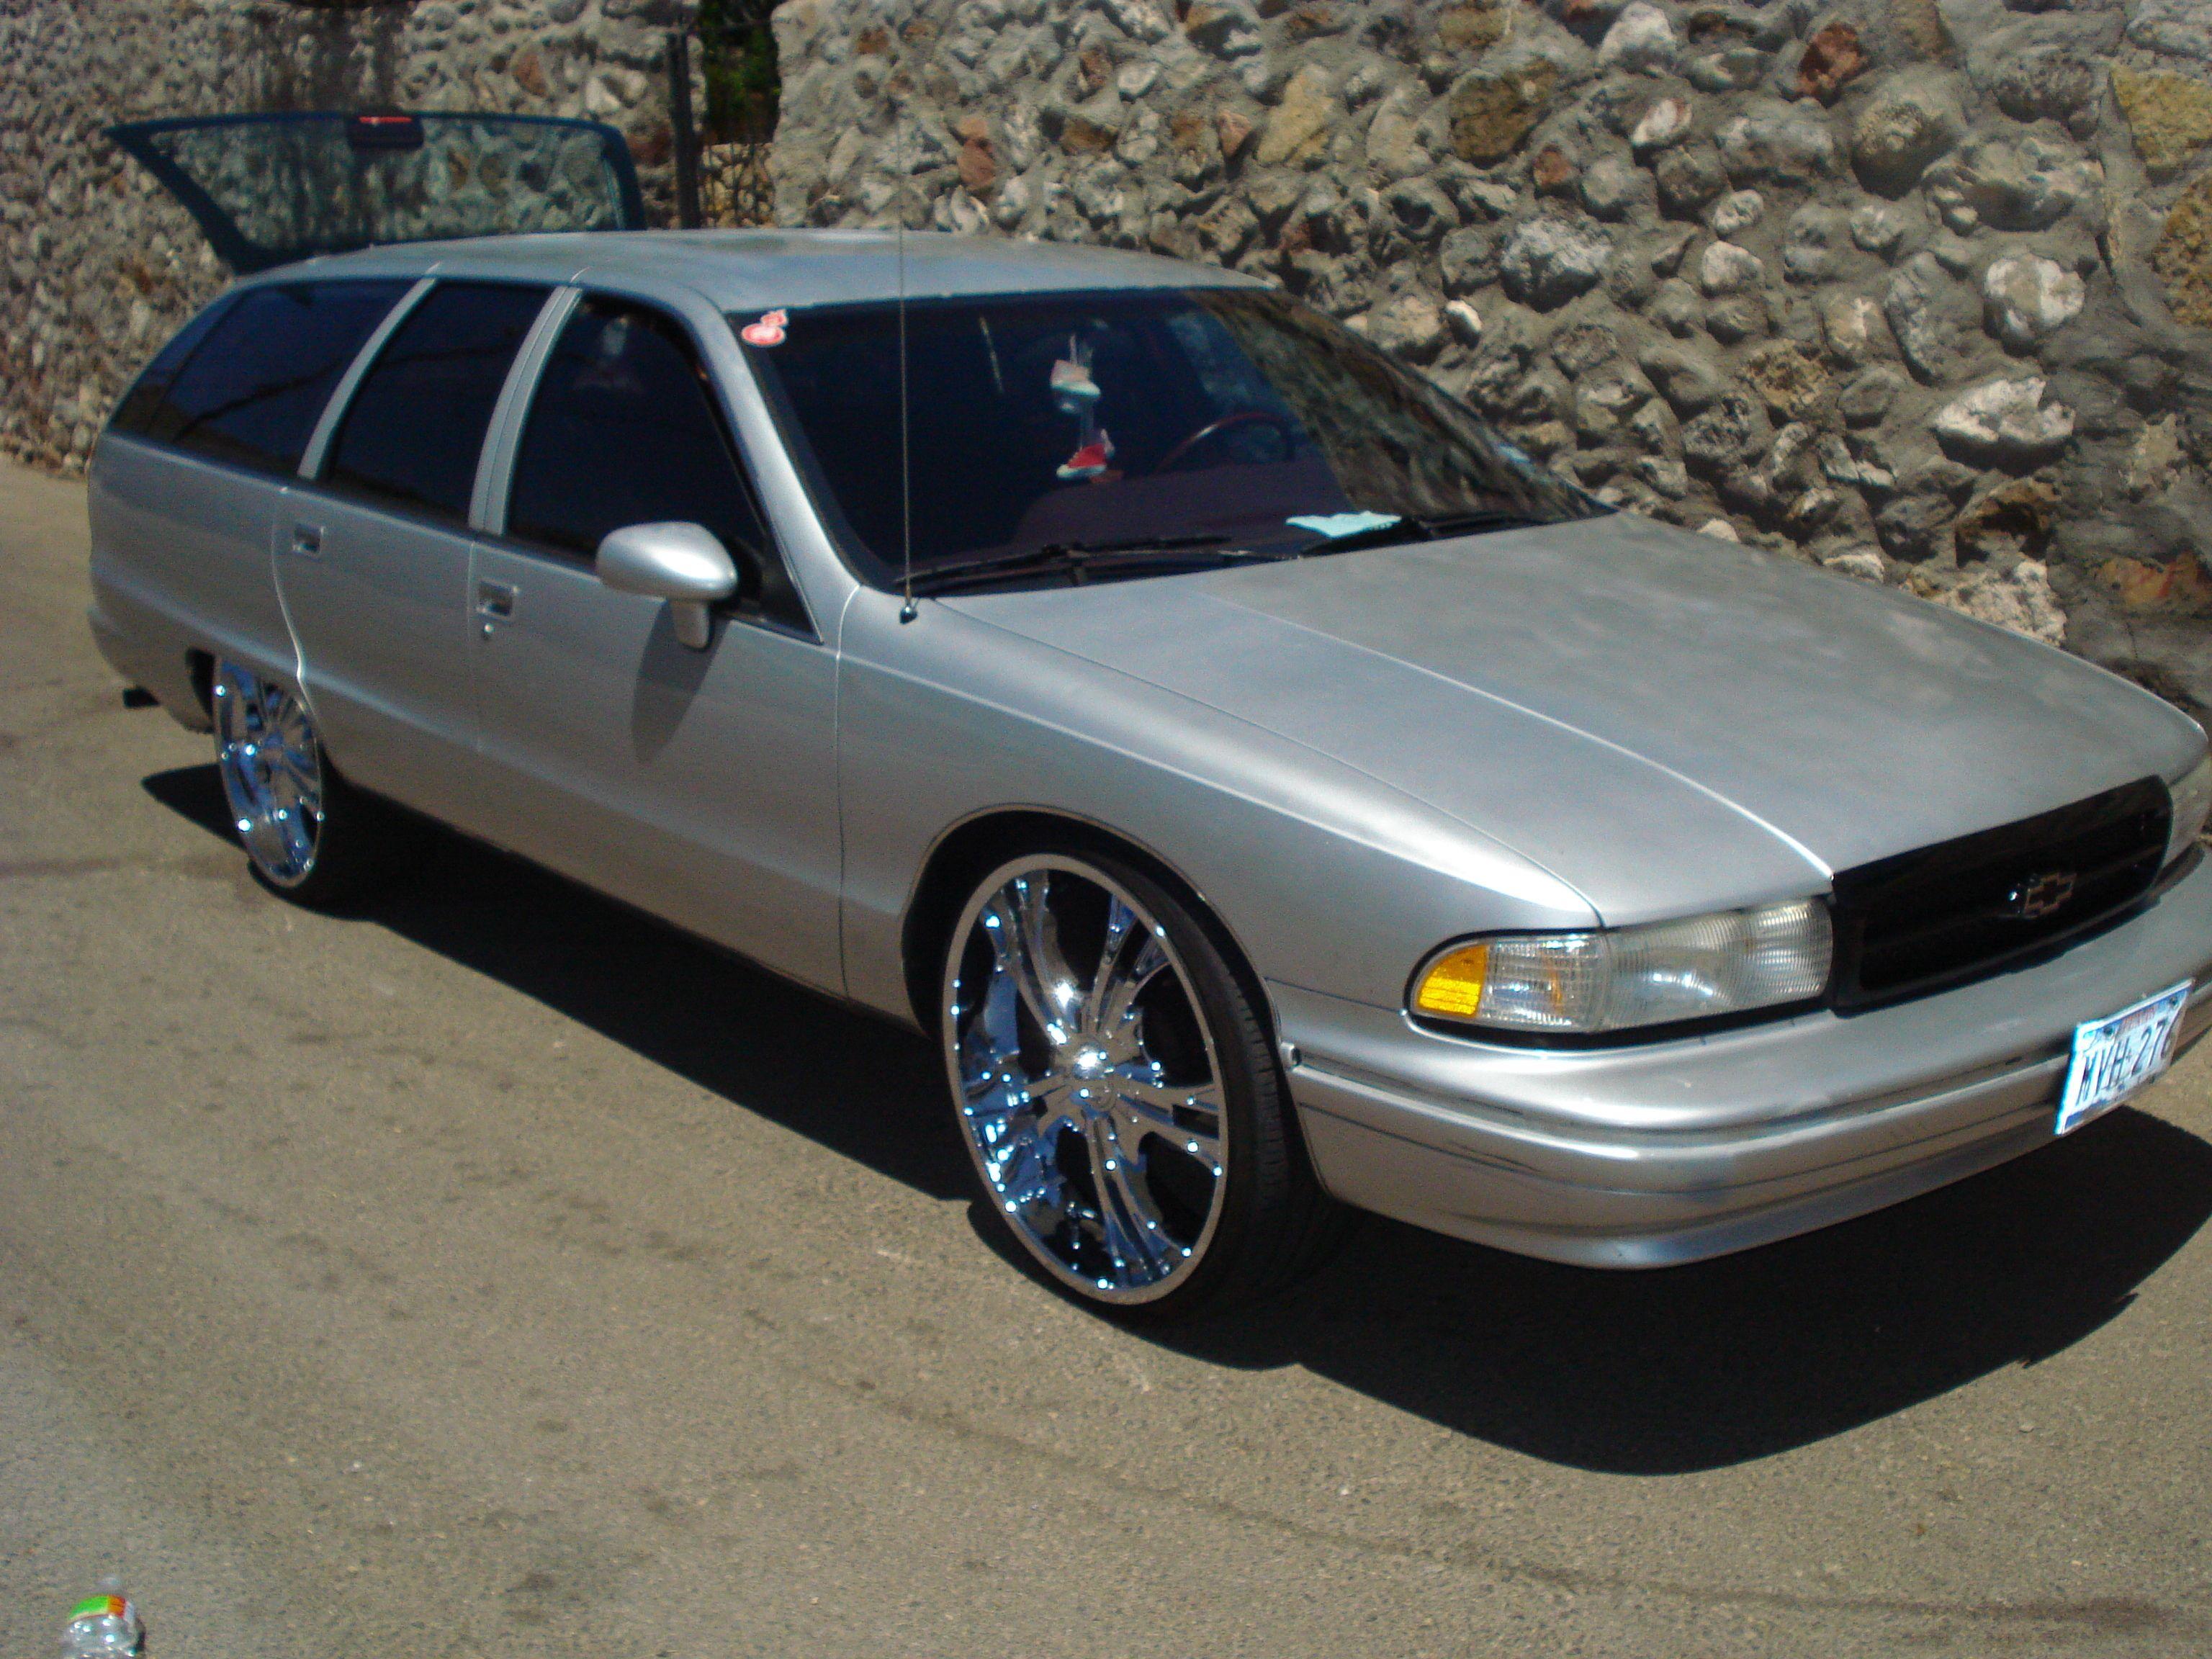 medium resolution of 1995 chevy caprice impala ss wagon